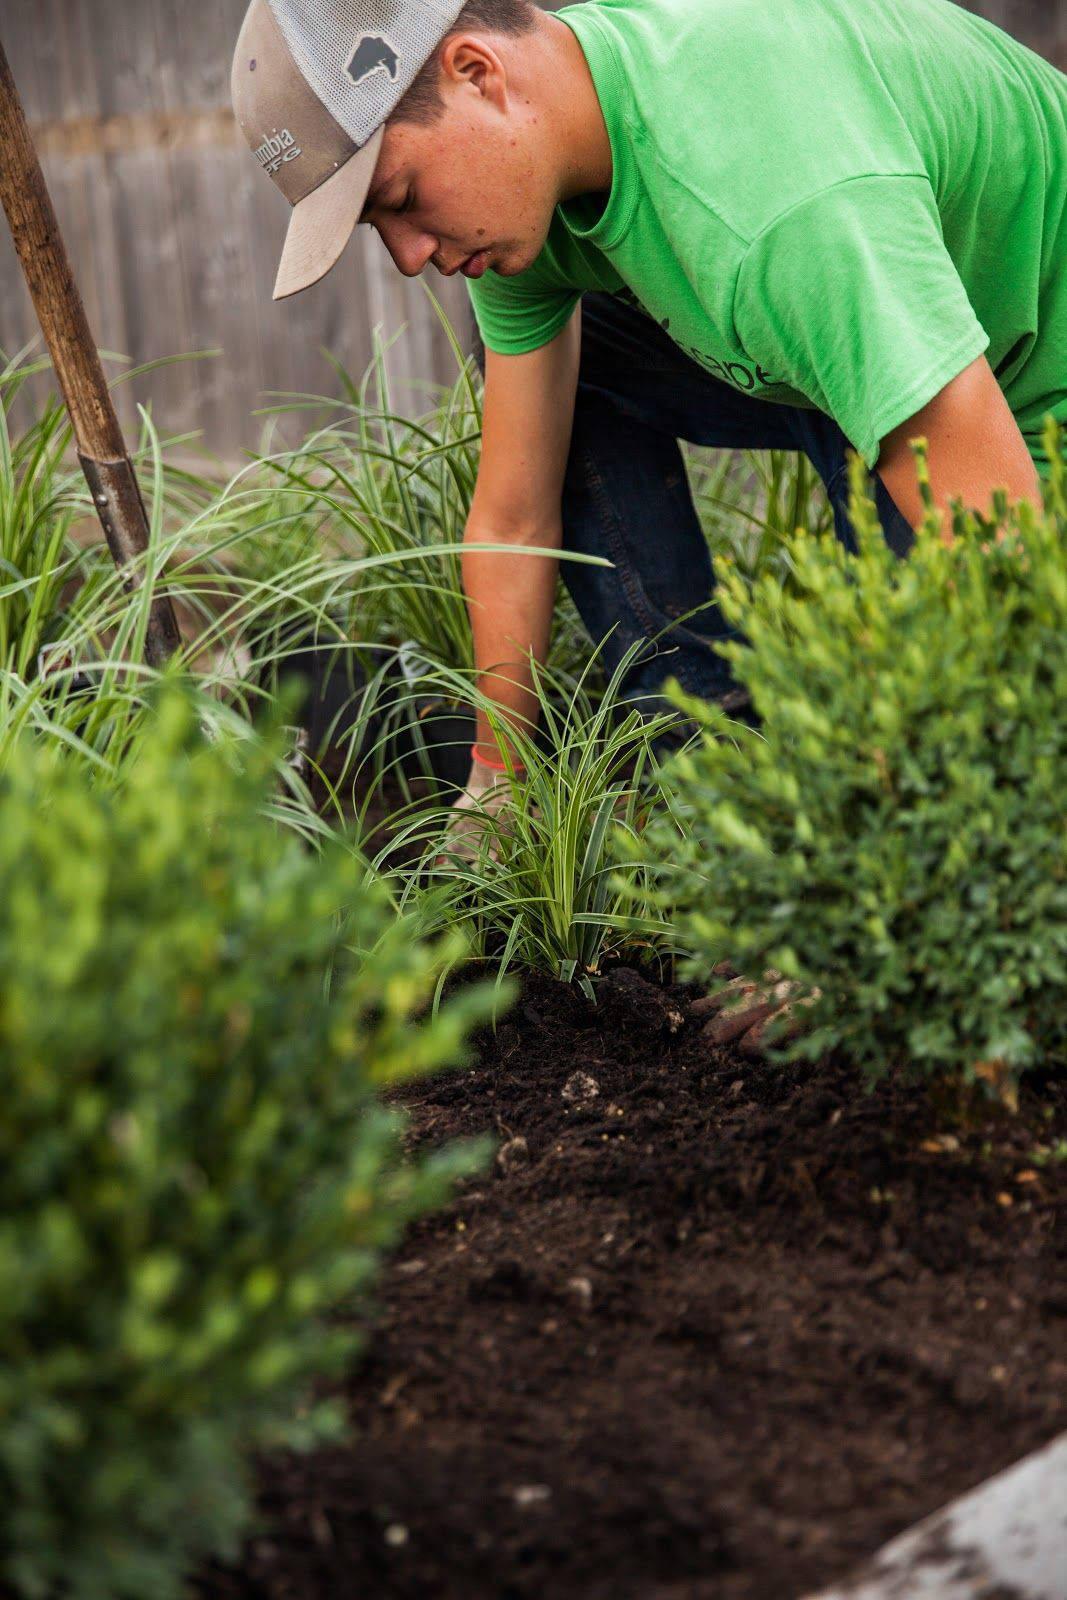 A landscaper checking the soil to maintain garden health.